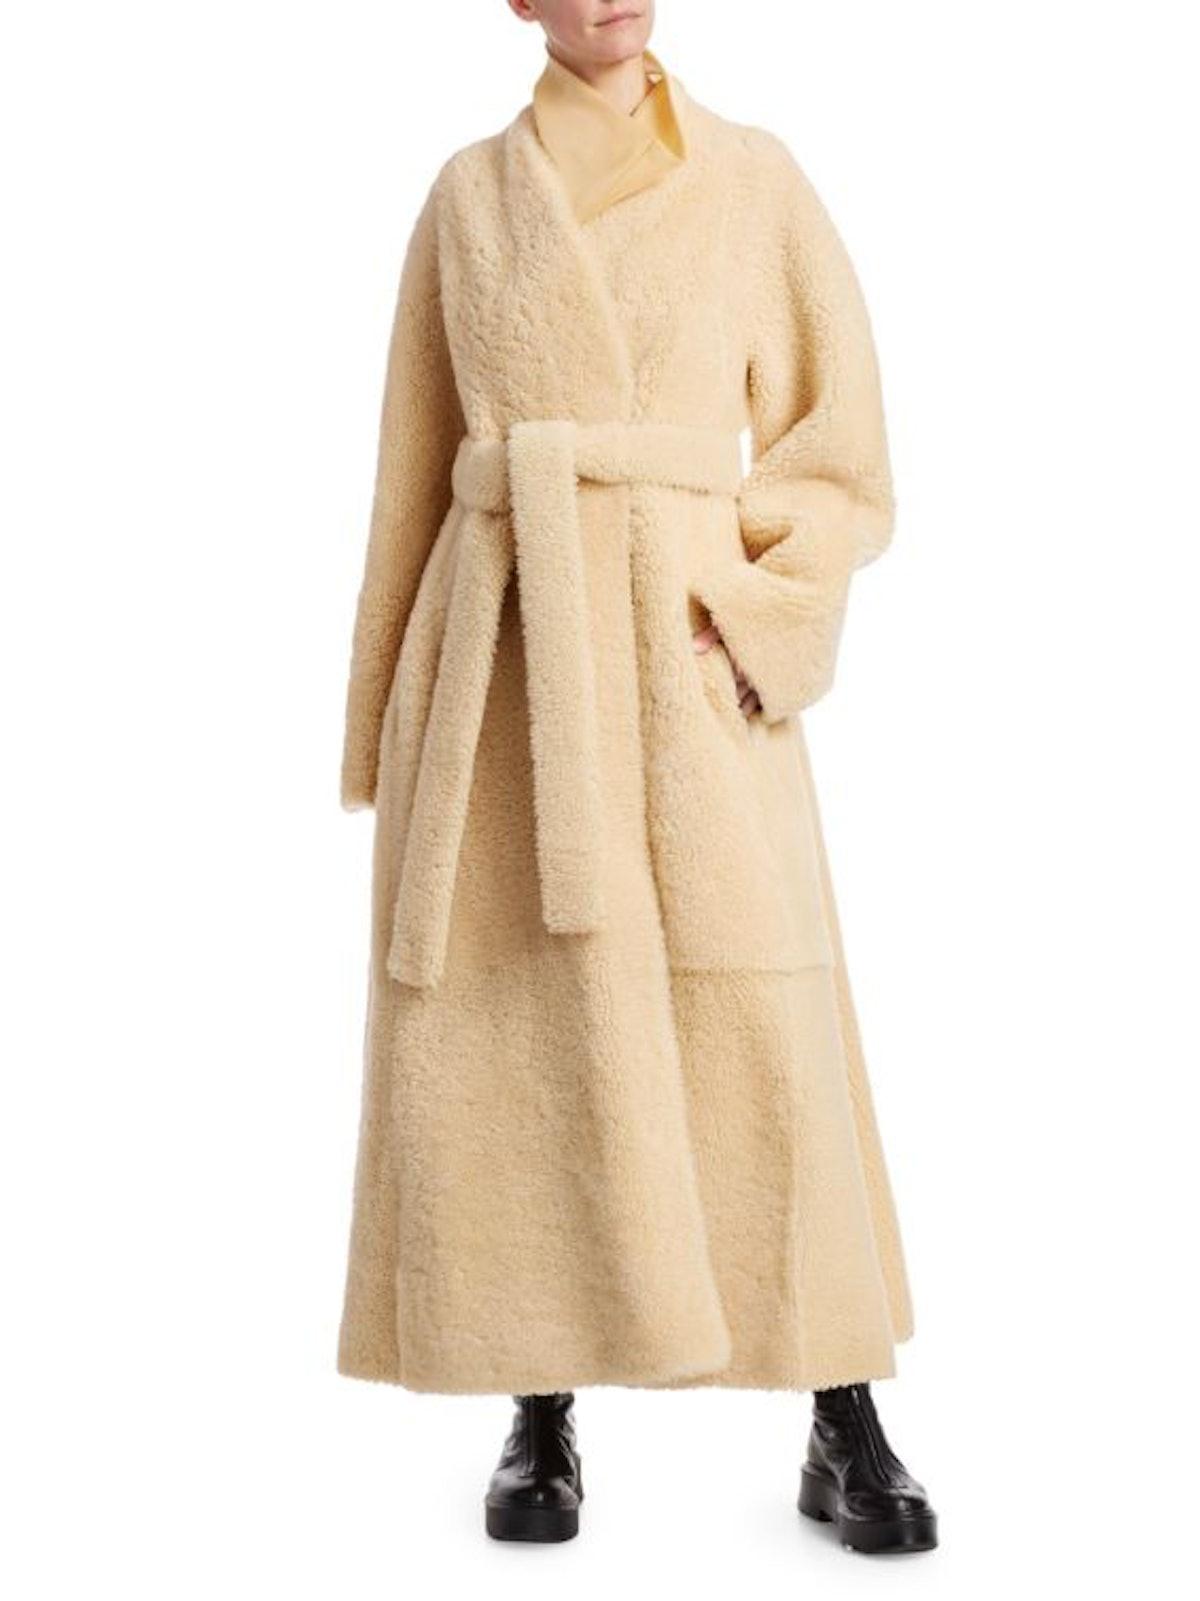 Tanilo Shearling Wrap Coat